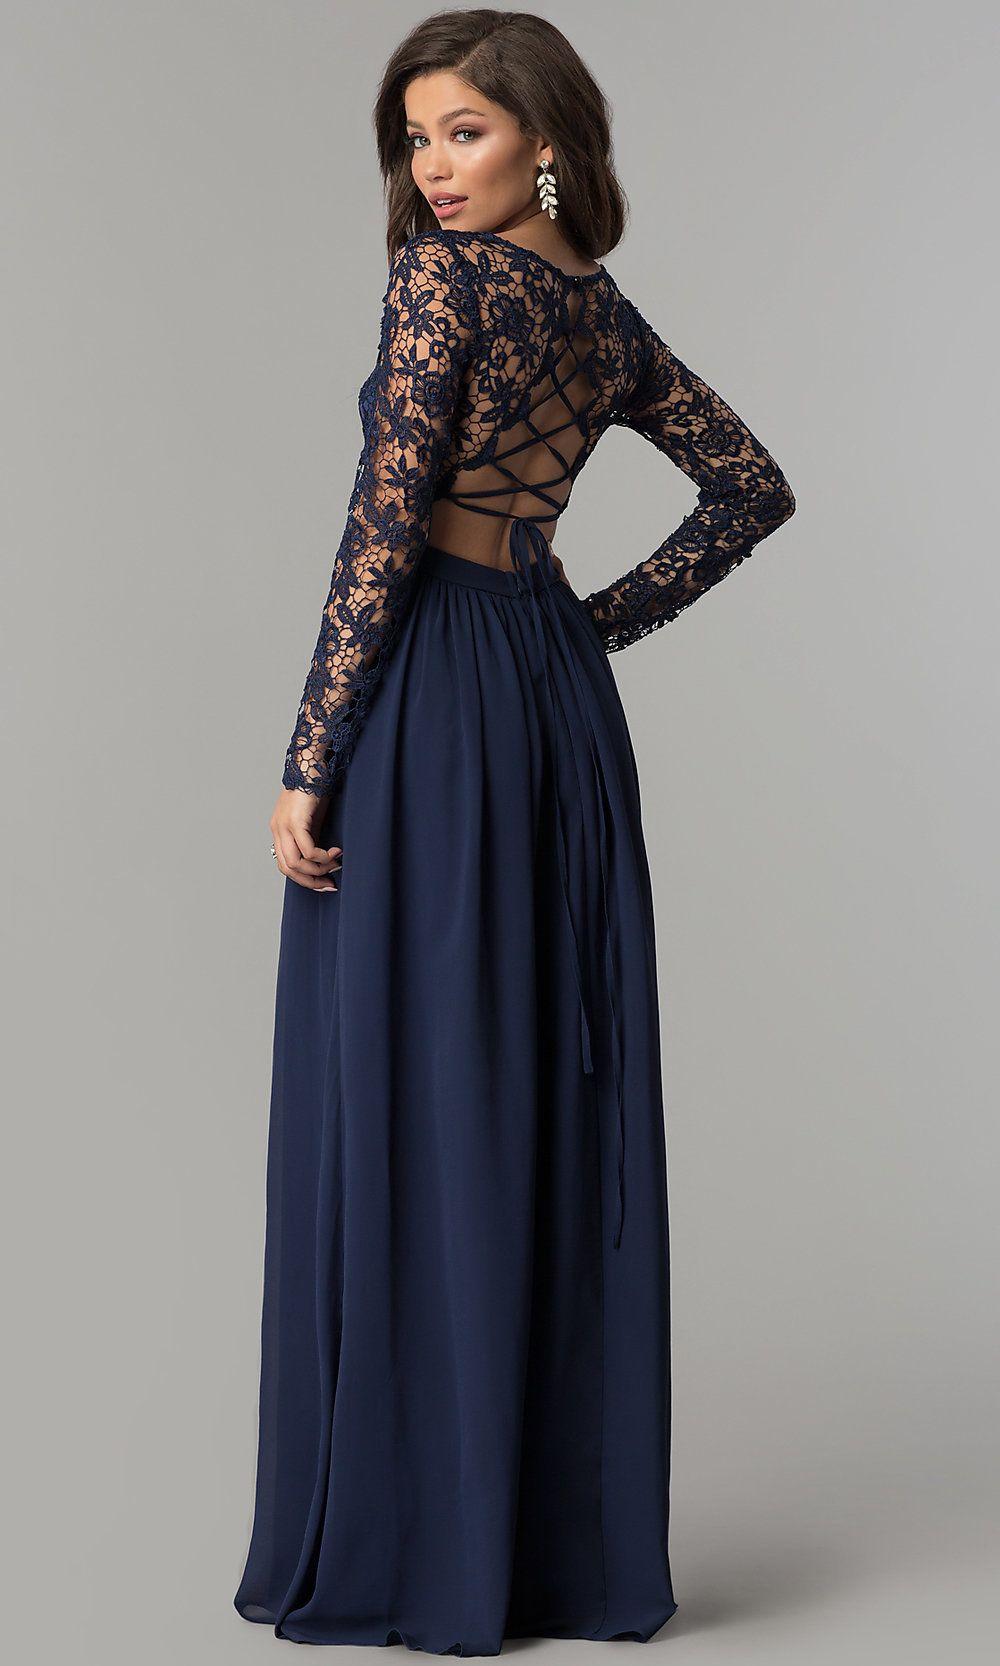 Lace Bodice Long Sleeve Corset Back Prom Dress Prom Dresses Long With Sleeves Long Sleeve Prom Dress Lace Long Sleeve Dress Formal [ 1666 x 1000 Pixel ]